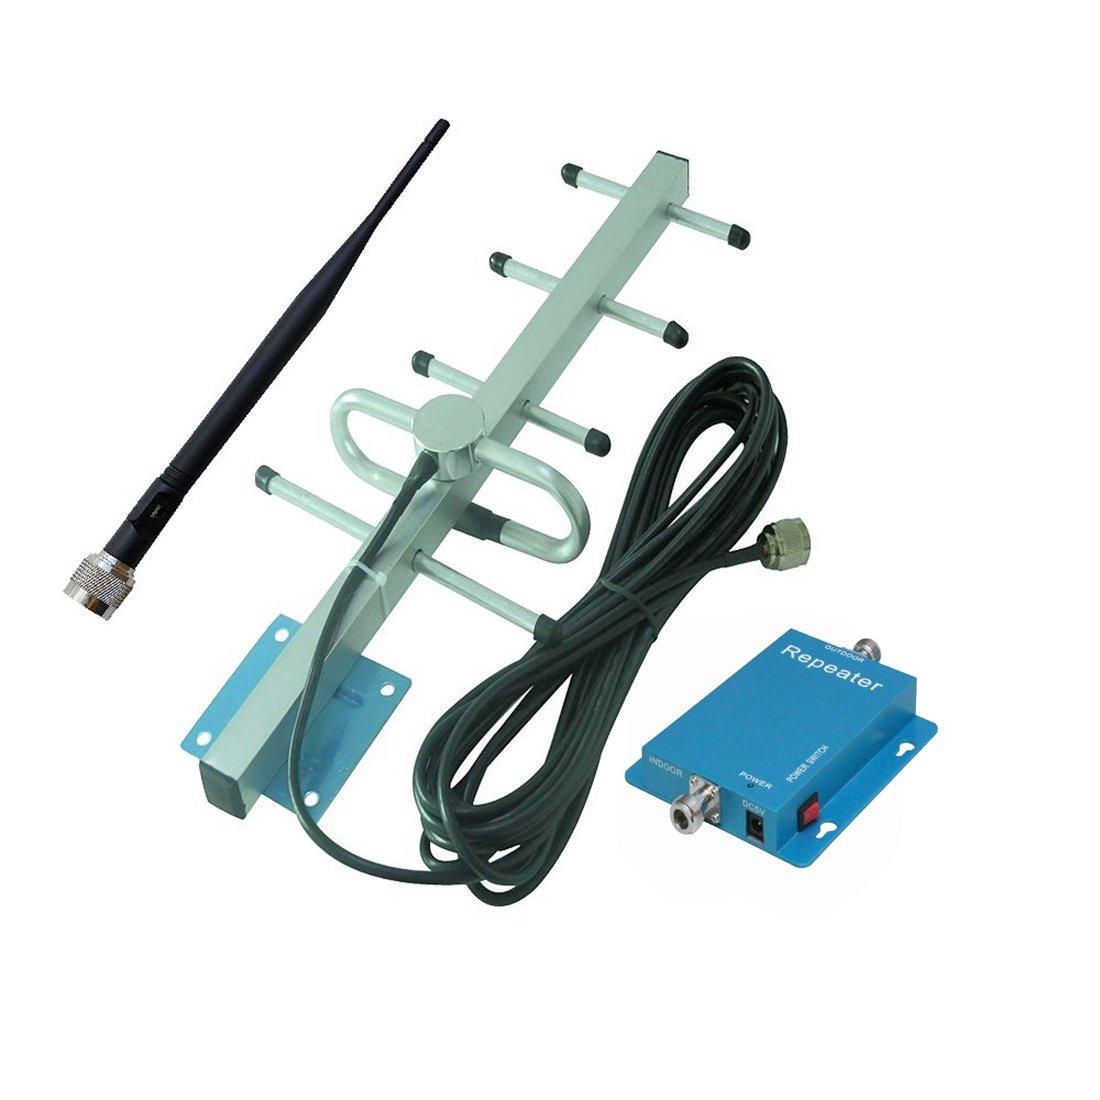 Signalbox Booster Amplifier Outdoor Antennas